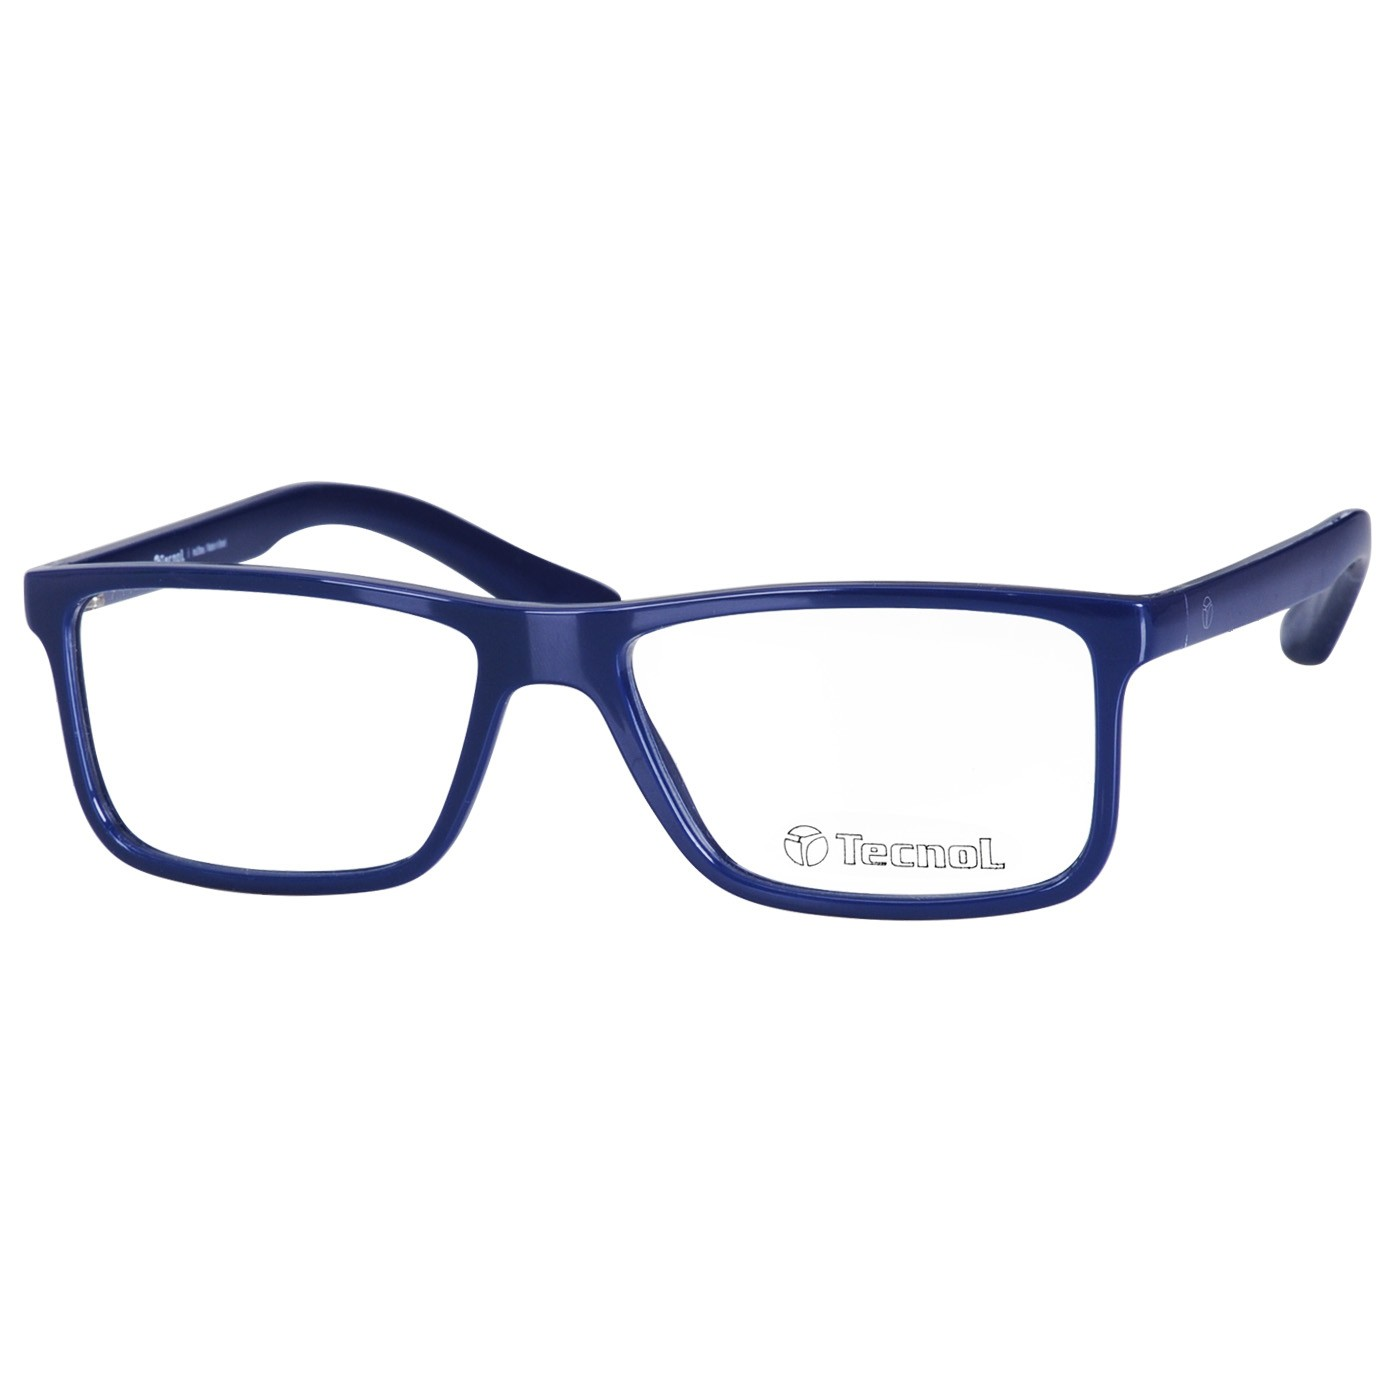 Óculos de Grau Tecnol TN3047 Masculino Azul Brilho Tamanho 54